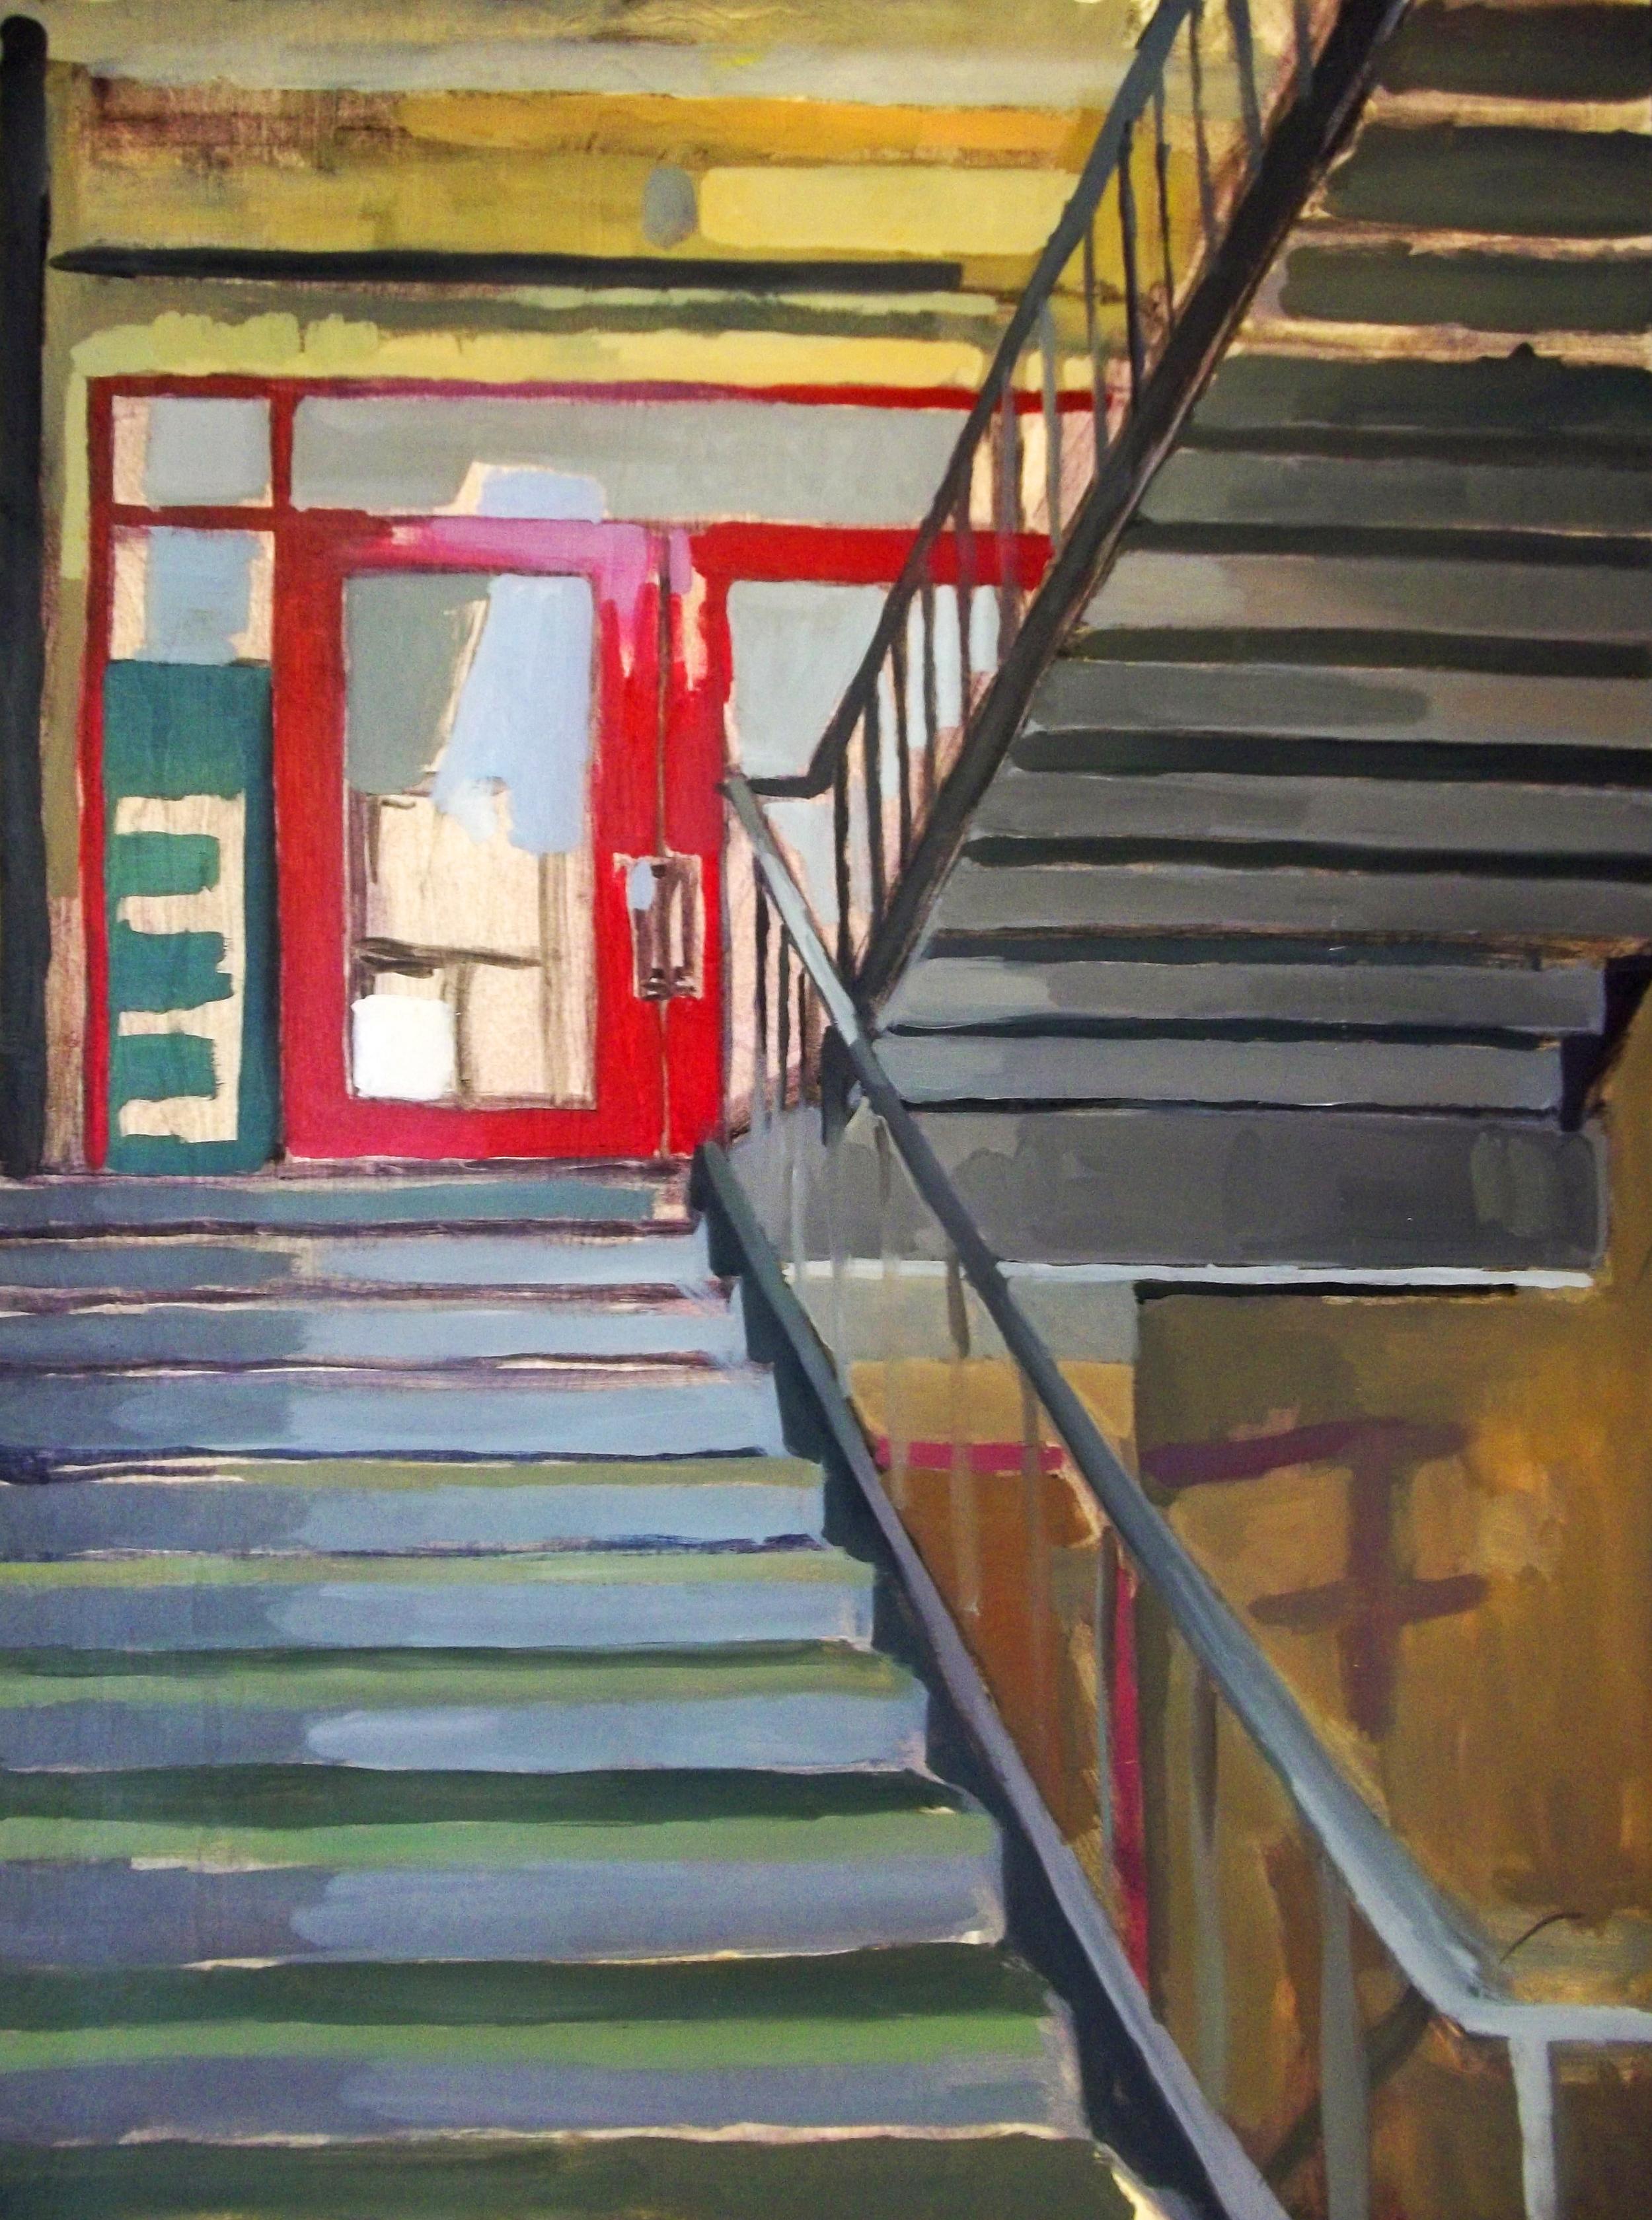 Hallway study